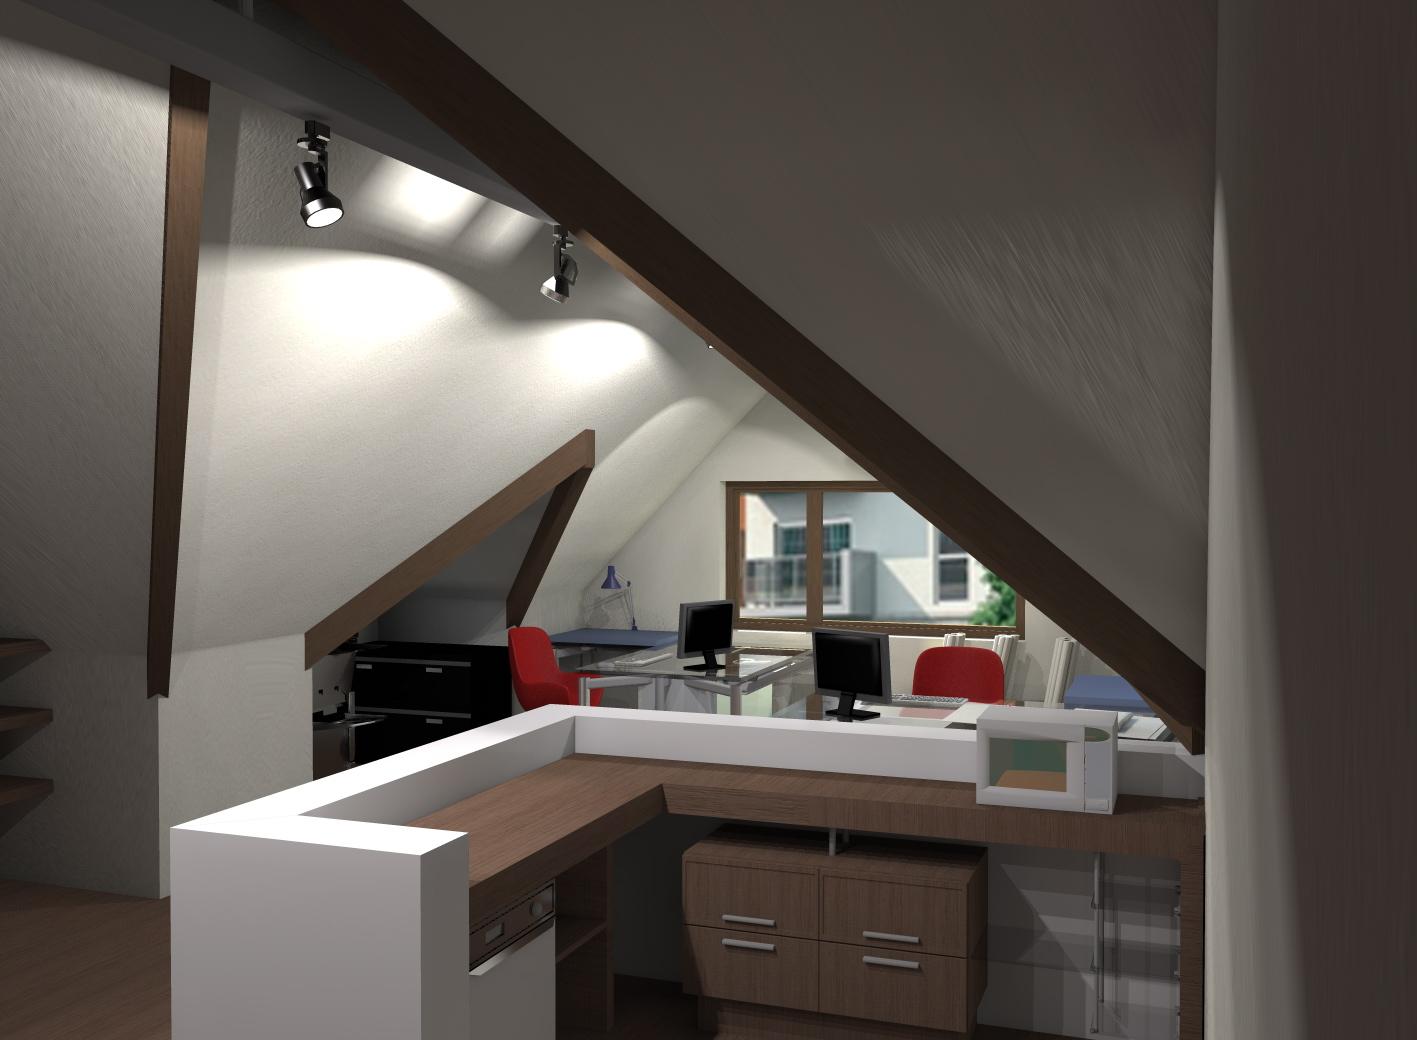 Mansarda birou design by anca manescu at